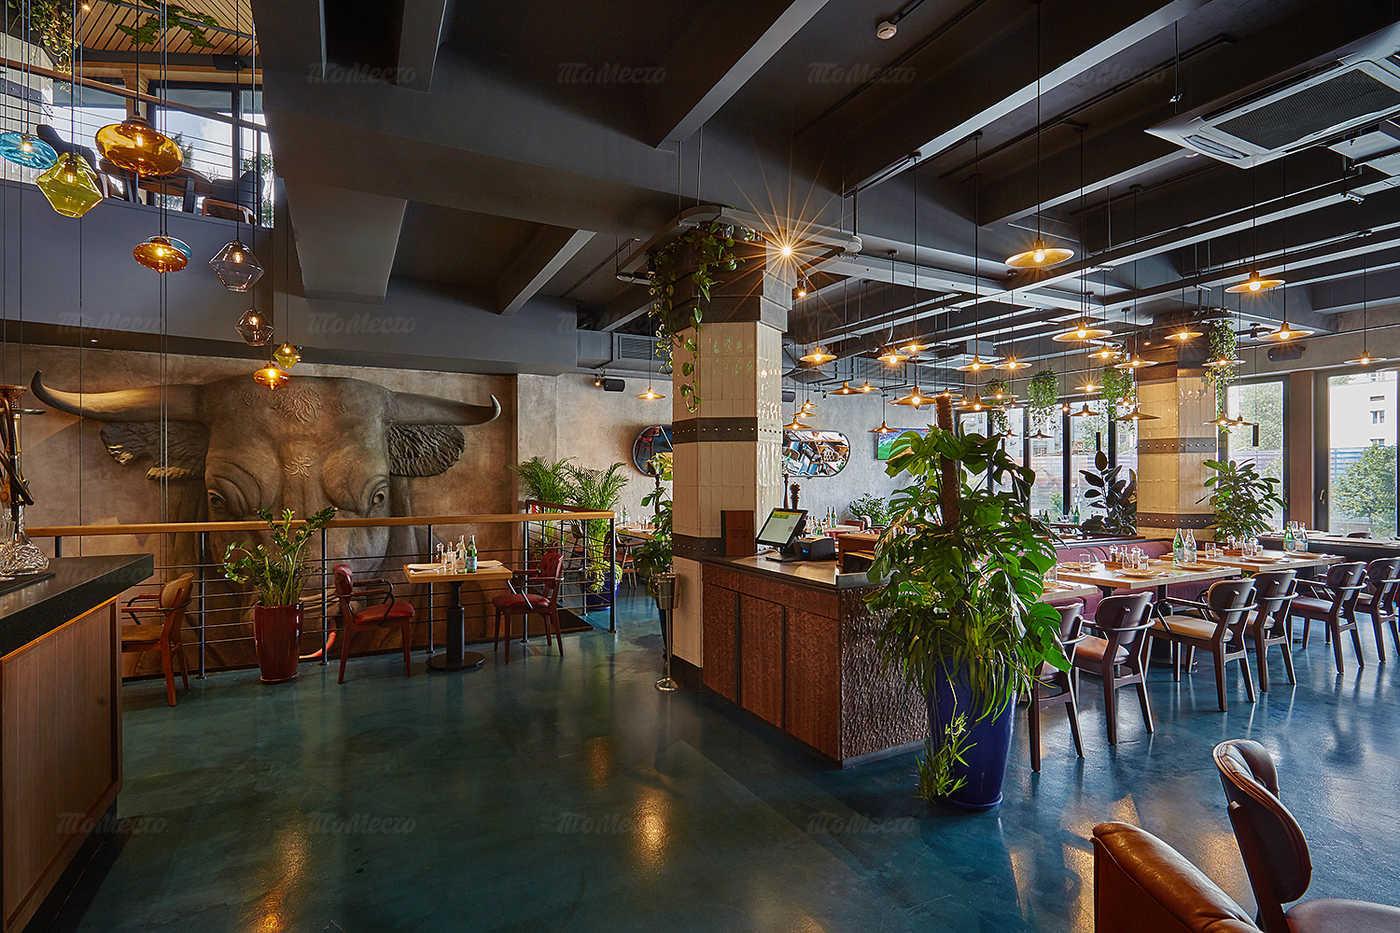 Ресторан Cihan (Джихан) На Новом Арбате фото 4